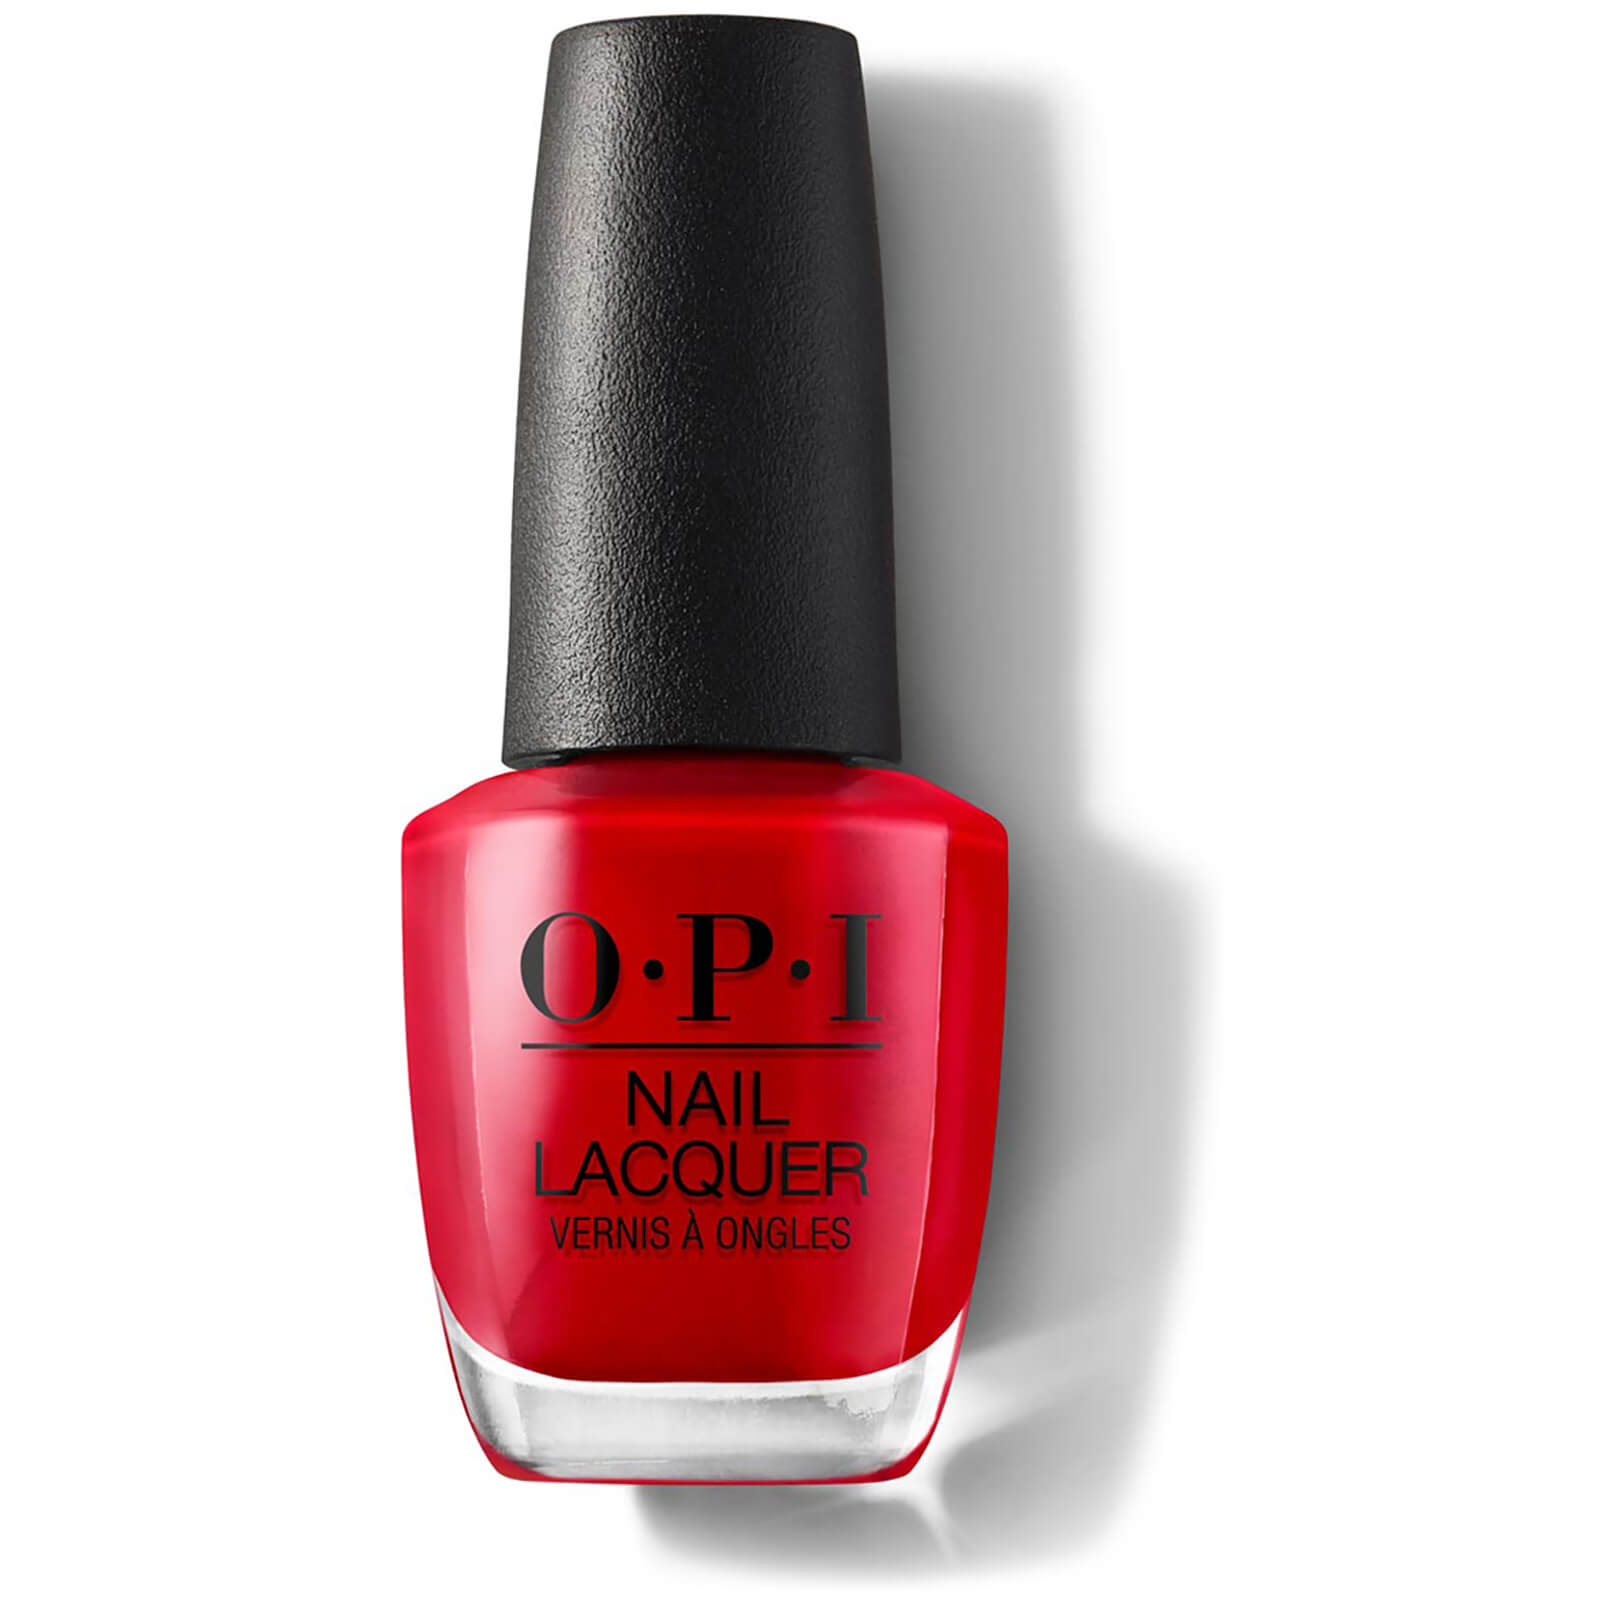 OPI 苹果红 指甲油